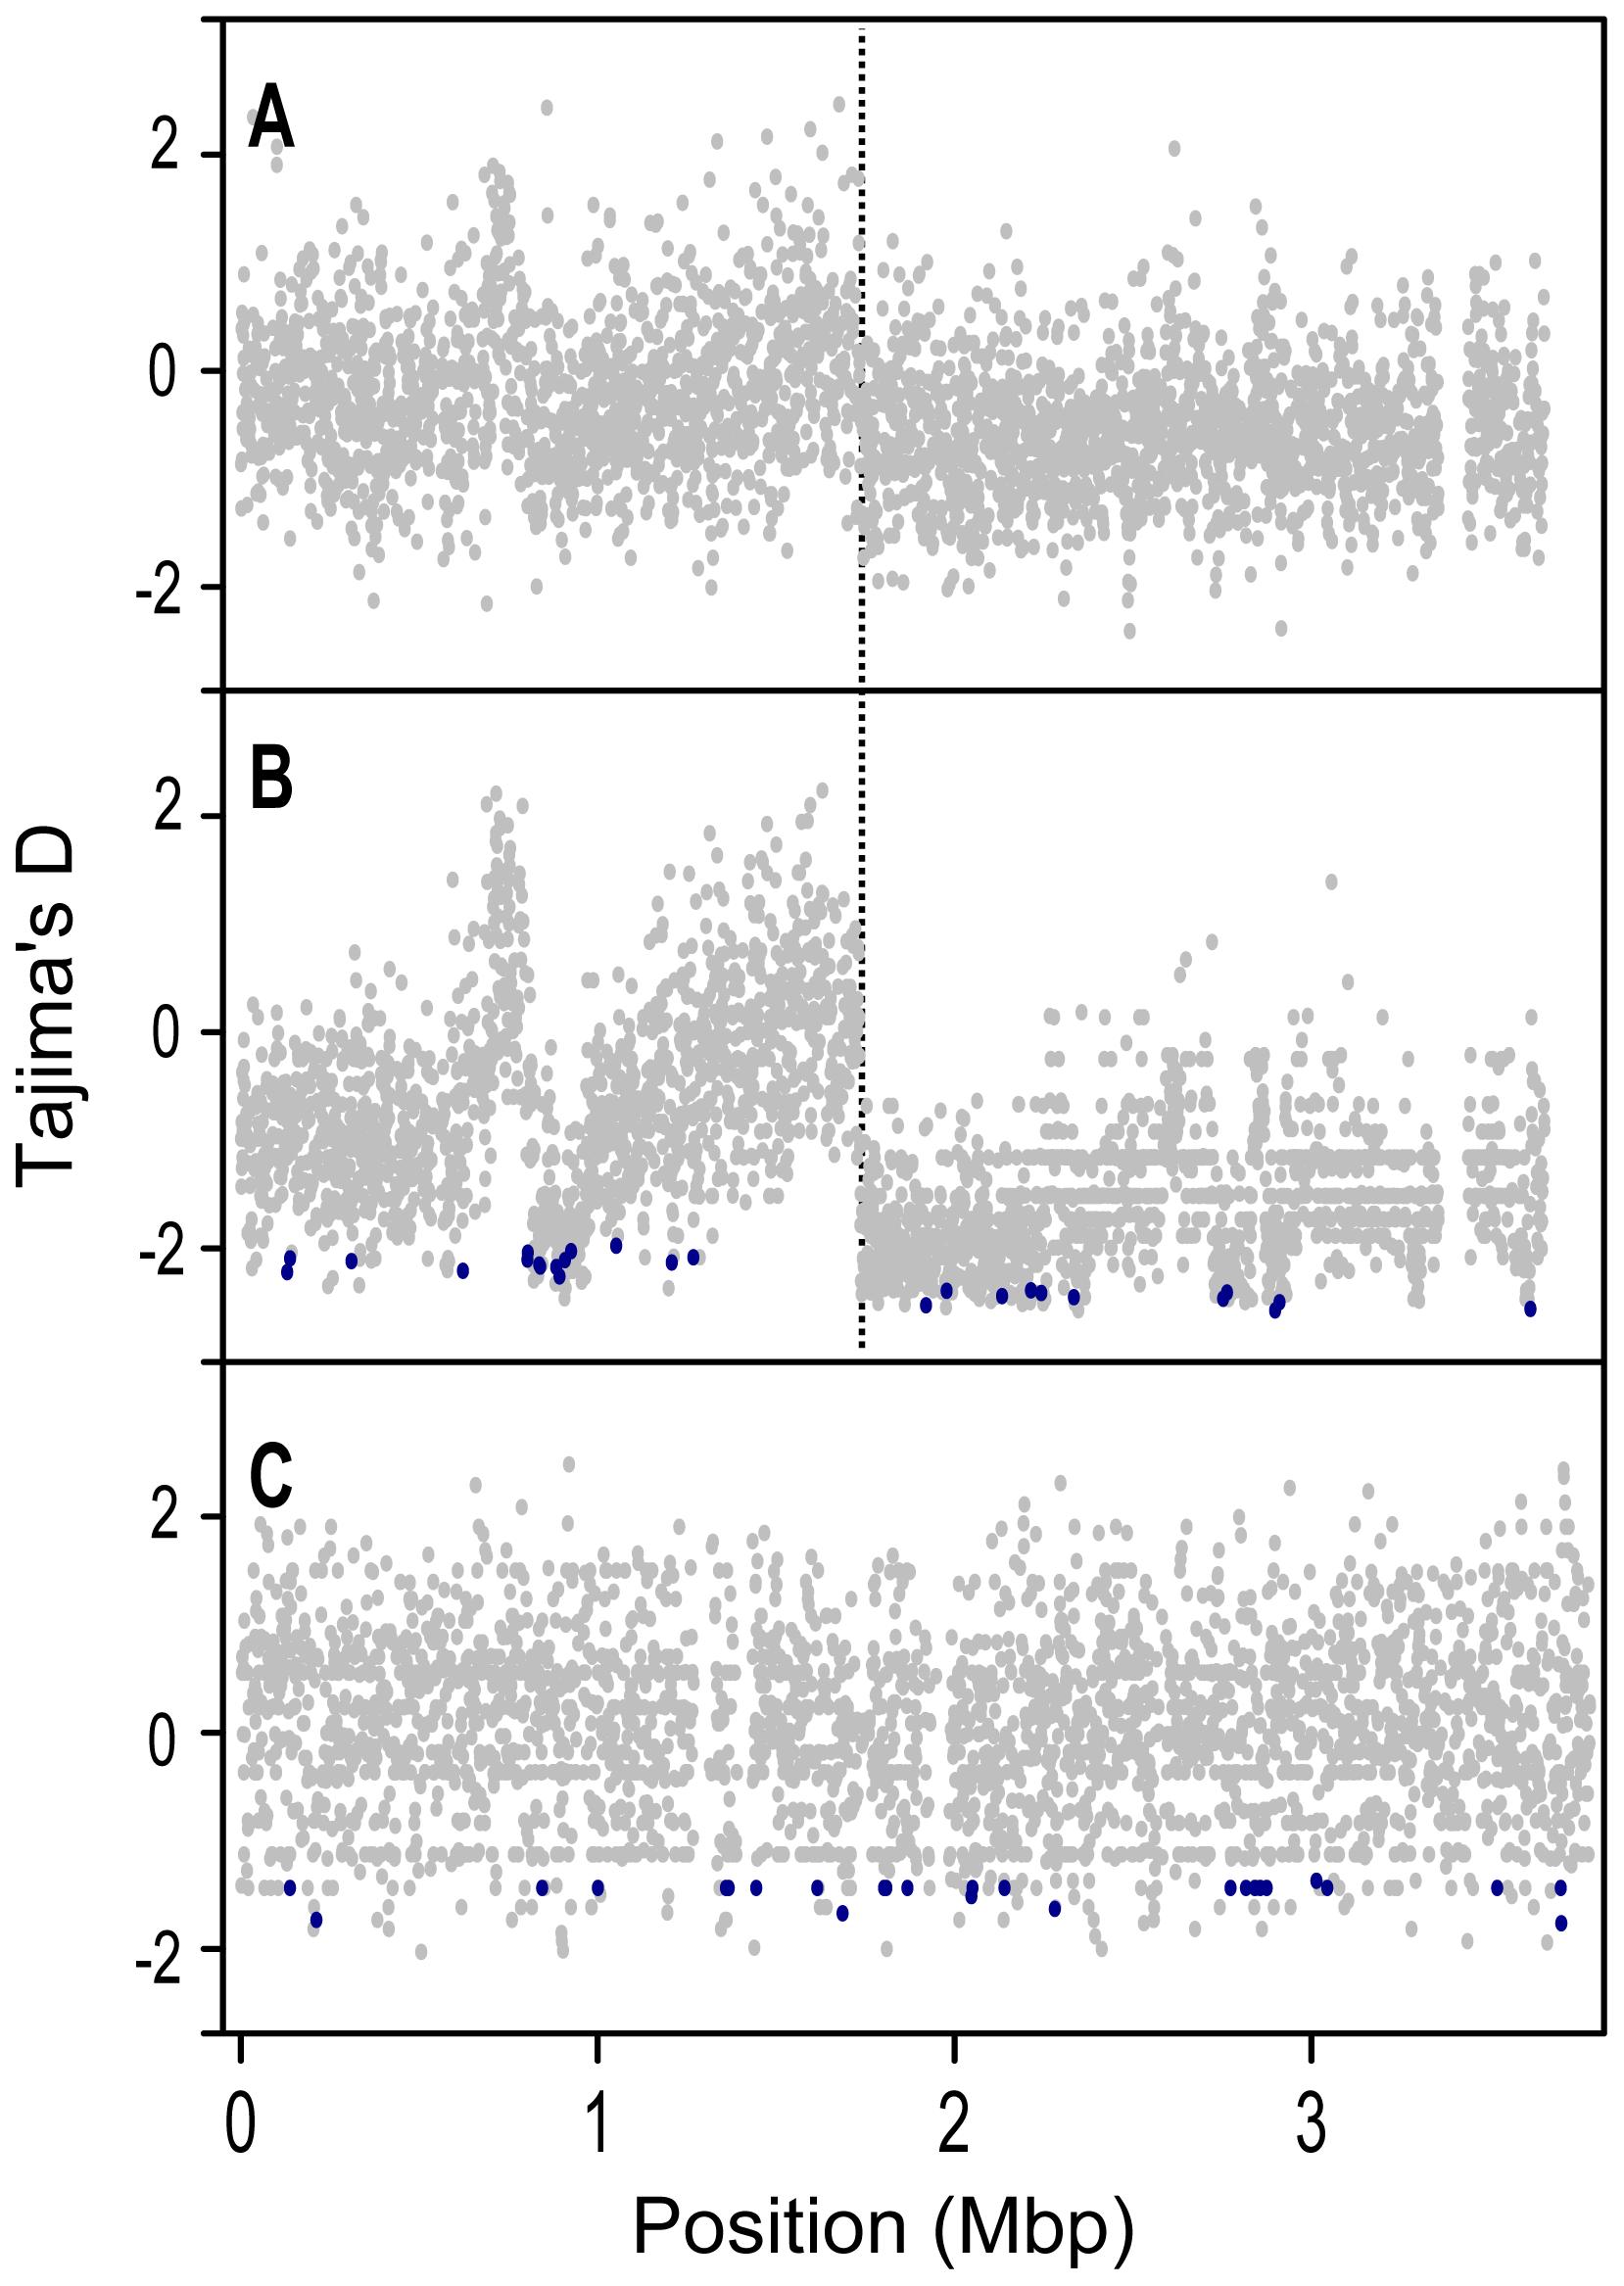 Tajima's D (<i>D<sub>T</sub></i>) values for protein coding genes along the length of the chromosome.